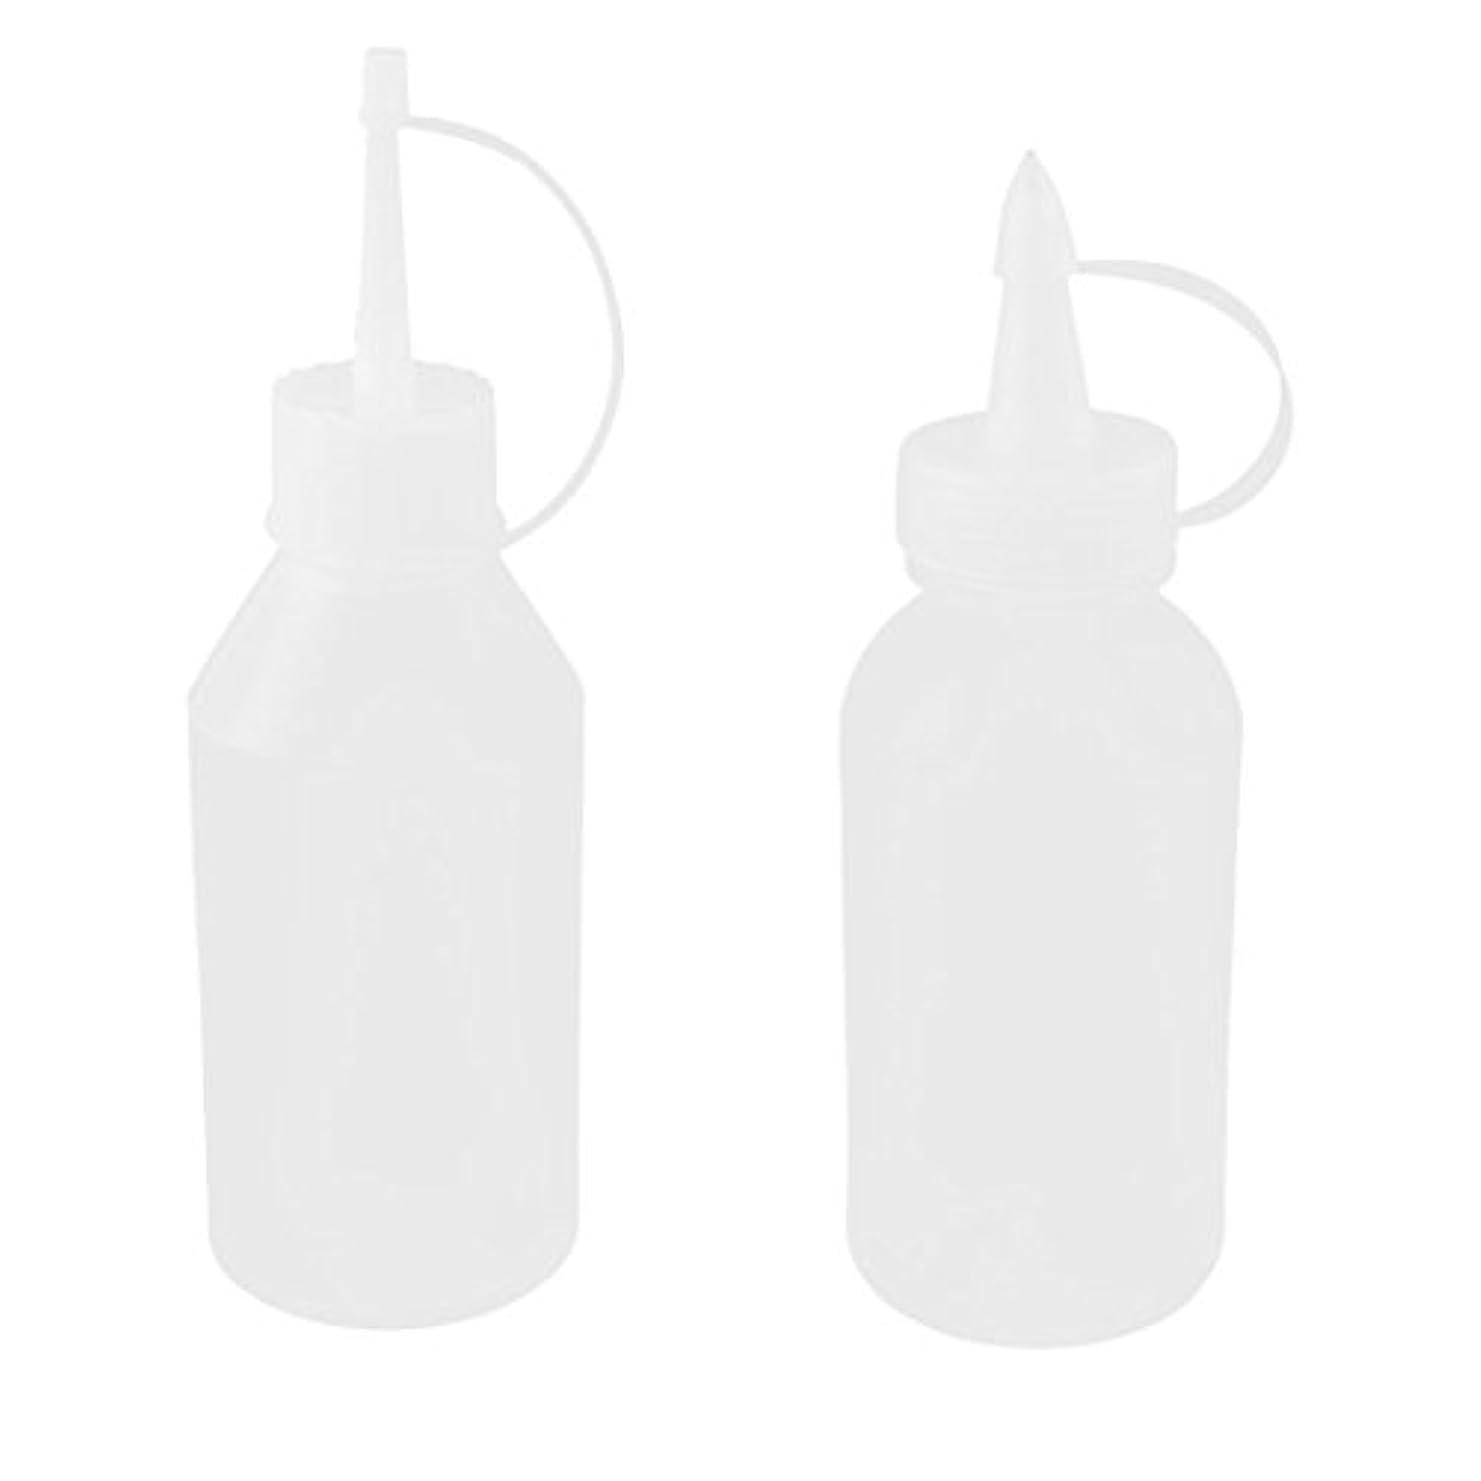 uxcell オイルボトル 油差し プラスチック 100ml ホワイト クリア 2個